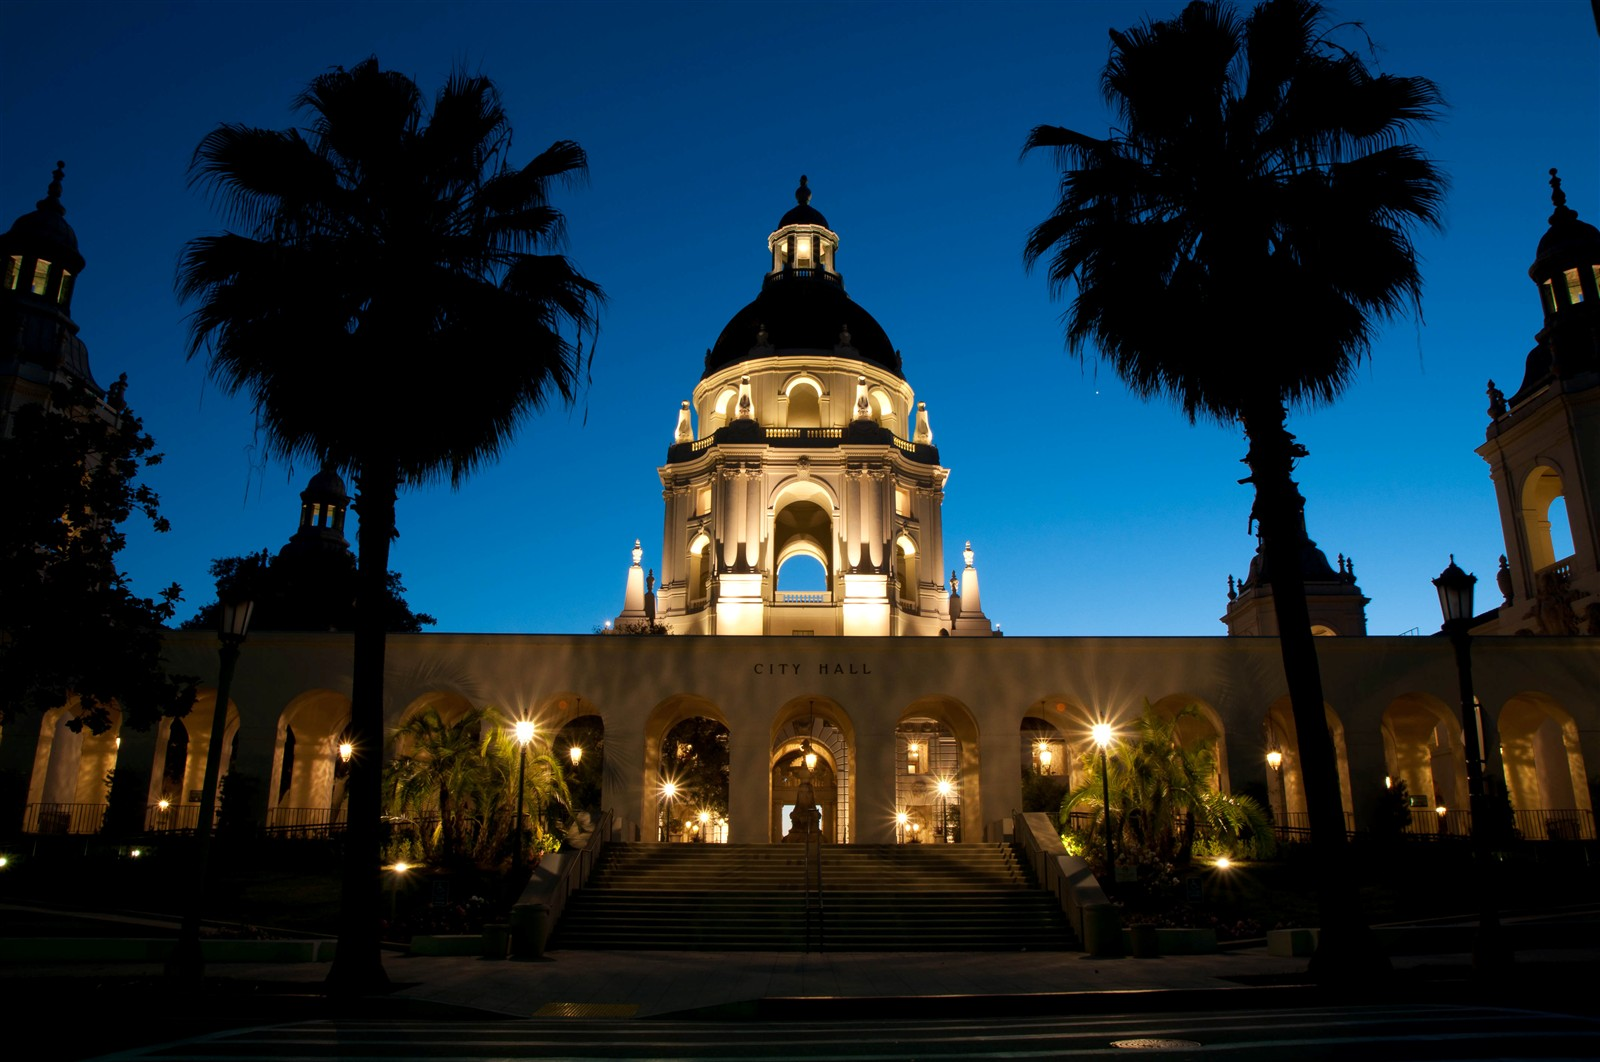 Pasadena City Hall (photo credit)